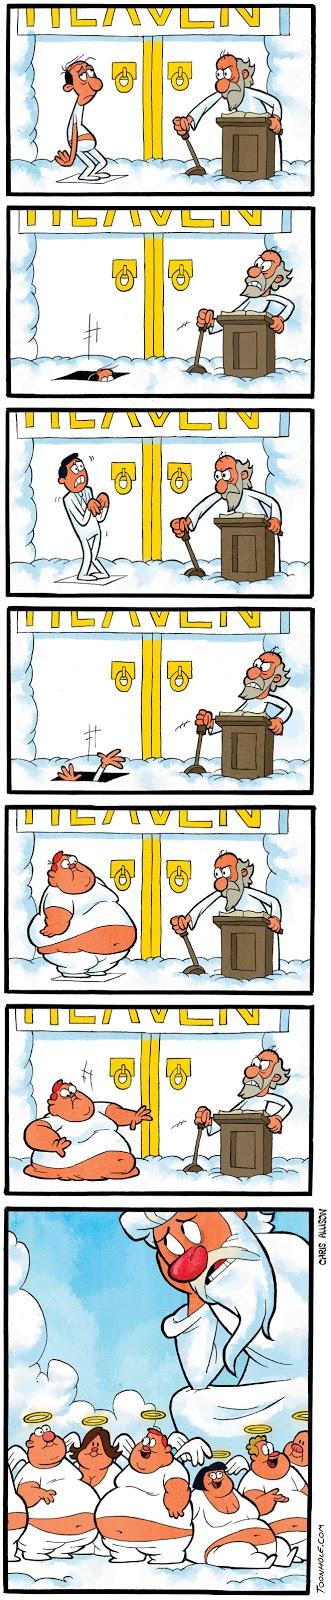 лазейка в рай 4 комикс